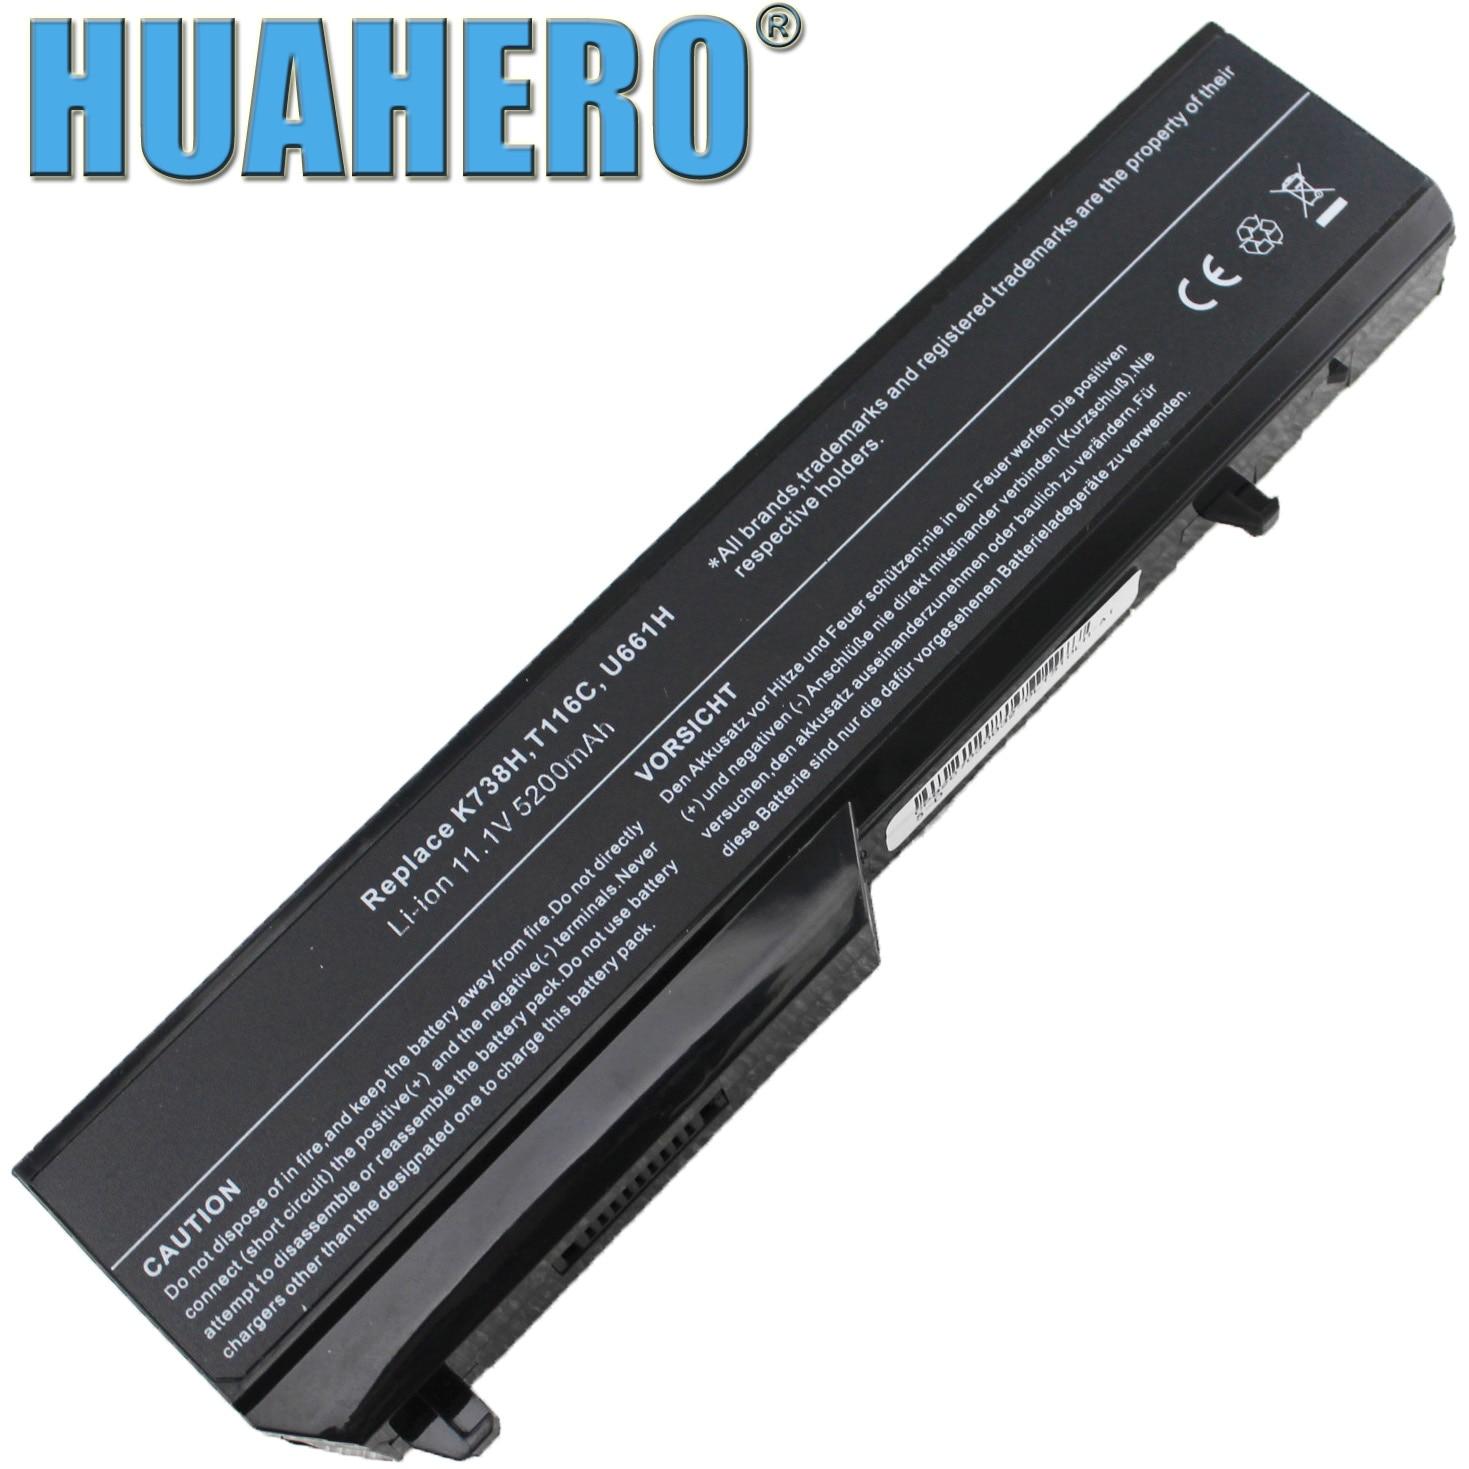 HUAHERO T116C Battery for Dell Vostro 1310 1320 1510 1520 2510 Laptop U661H T114C T112C N950C K738H312-0859 312-0724 0T116C PC